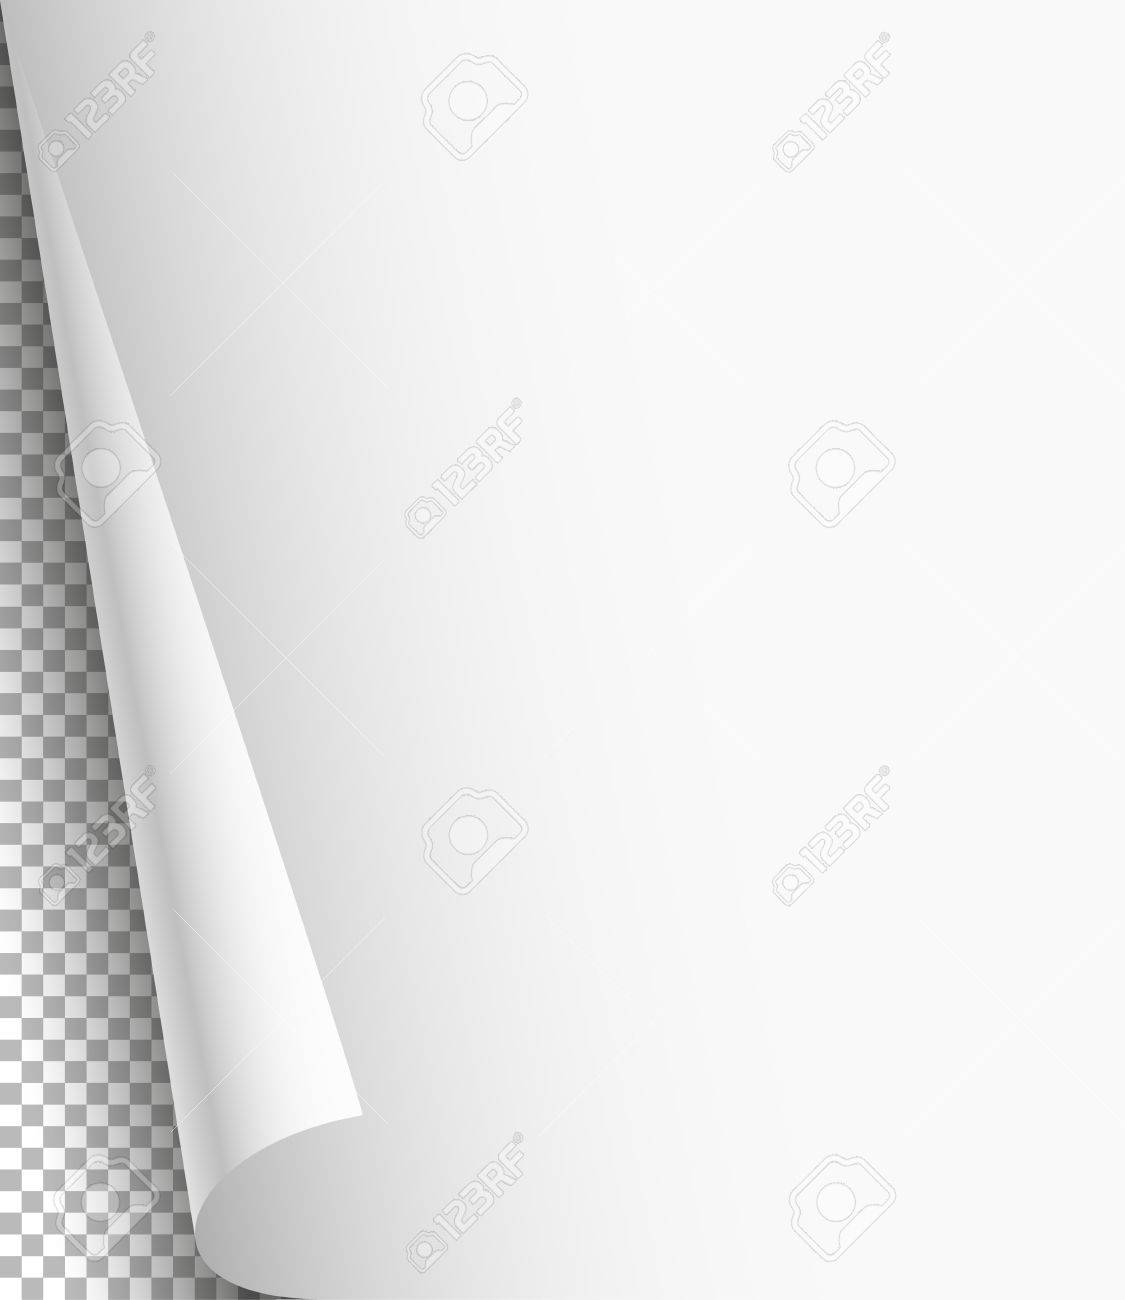 Blank Paper Sheet With Bending Corner On Transparent Background – Blank Paper Background